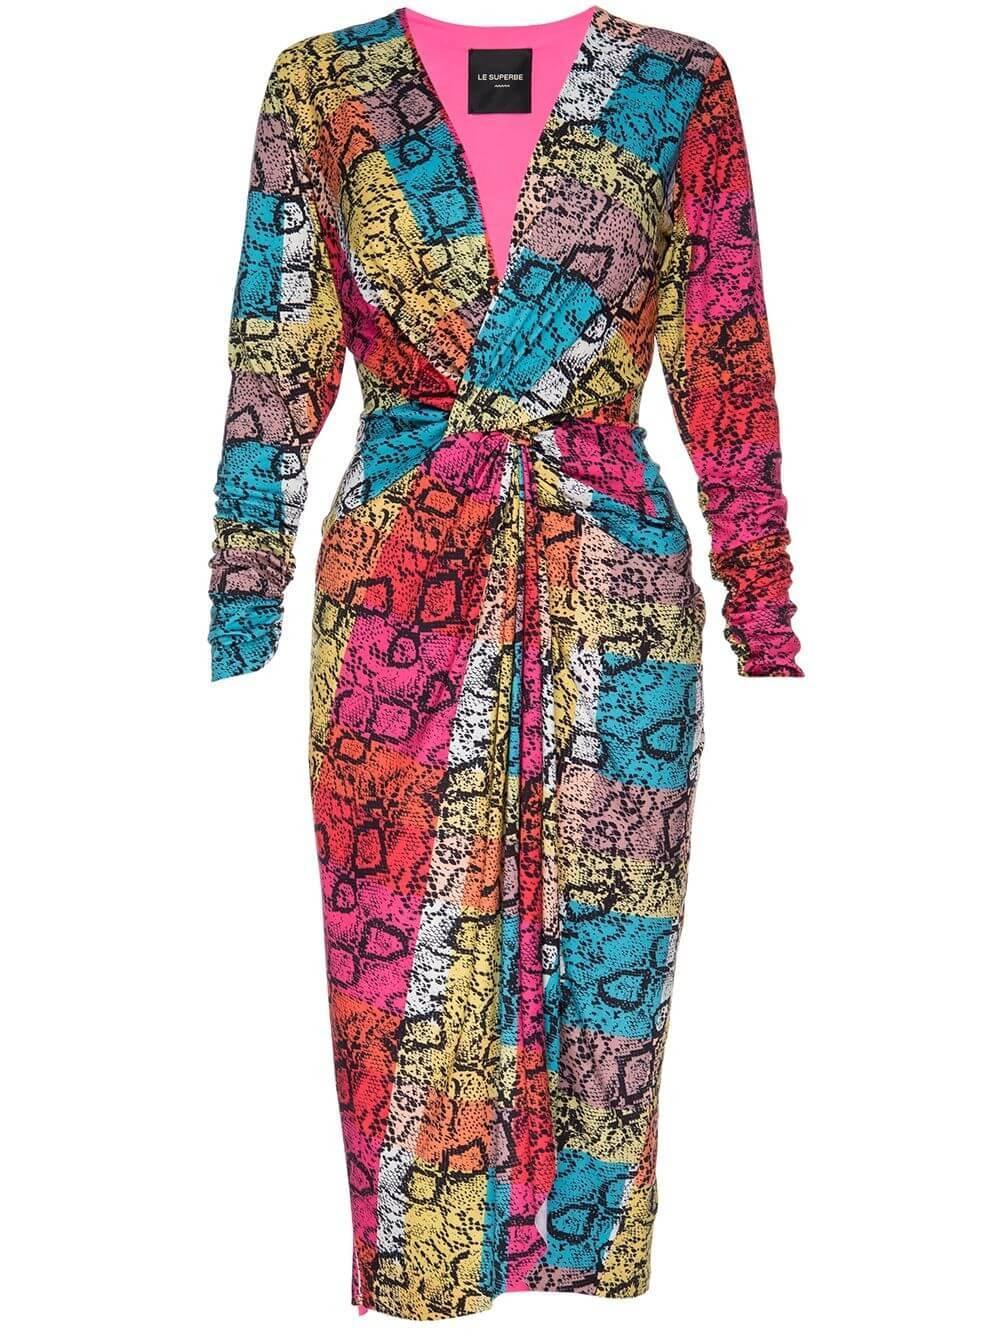 Baller Rainbow Dress Item # SP20-616RS